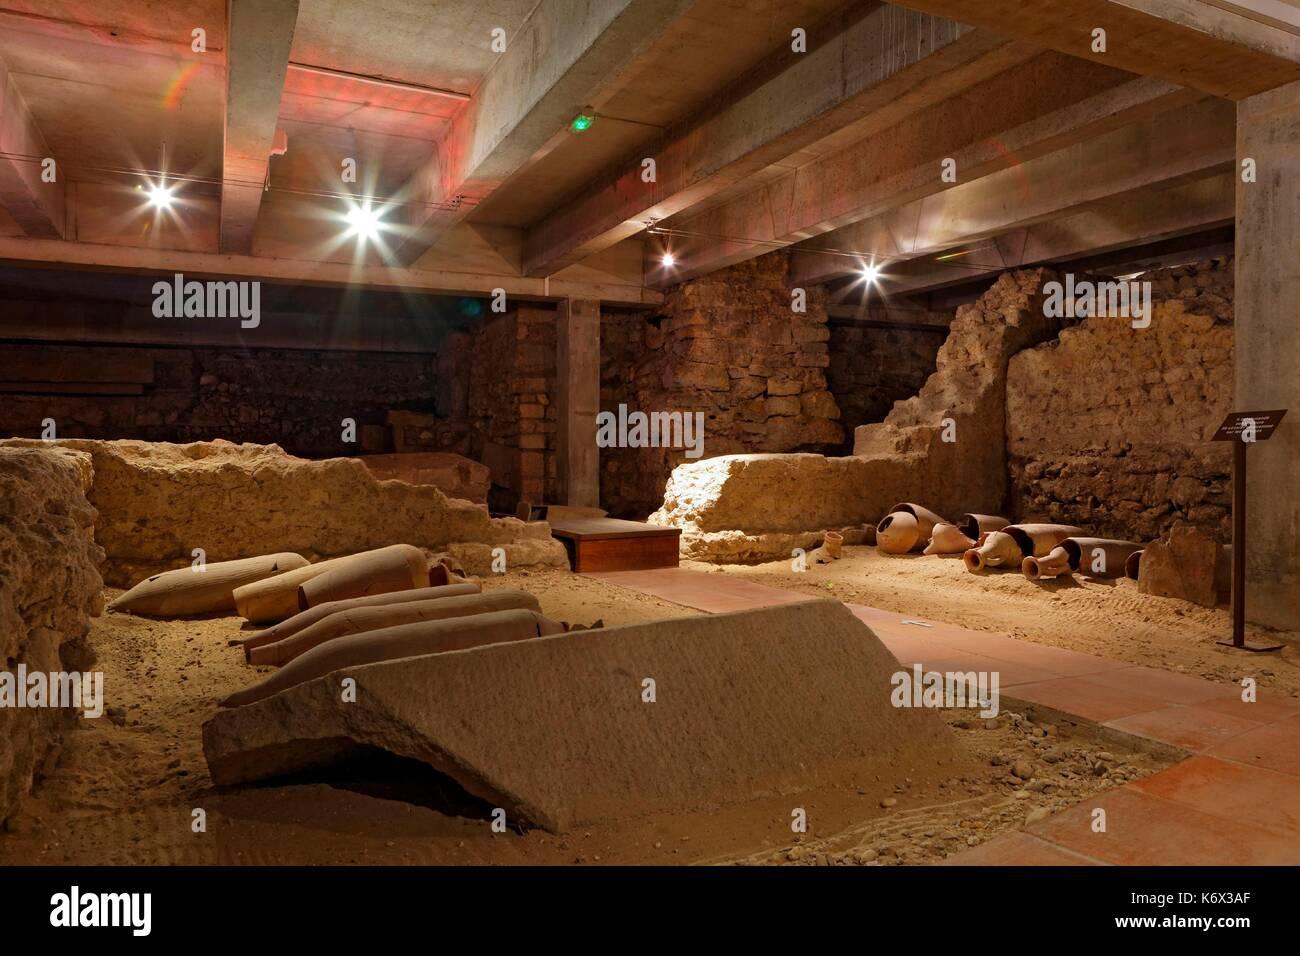 Frankreich, Gironde, Bordeaux, als Weltkulturerbe der UNESCO, des Martyrs de la Widerstand Square, dem Saint Seurin Basilika, archäologische Funde Stockbild